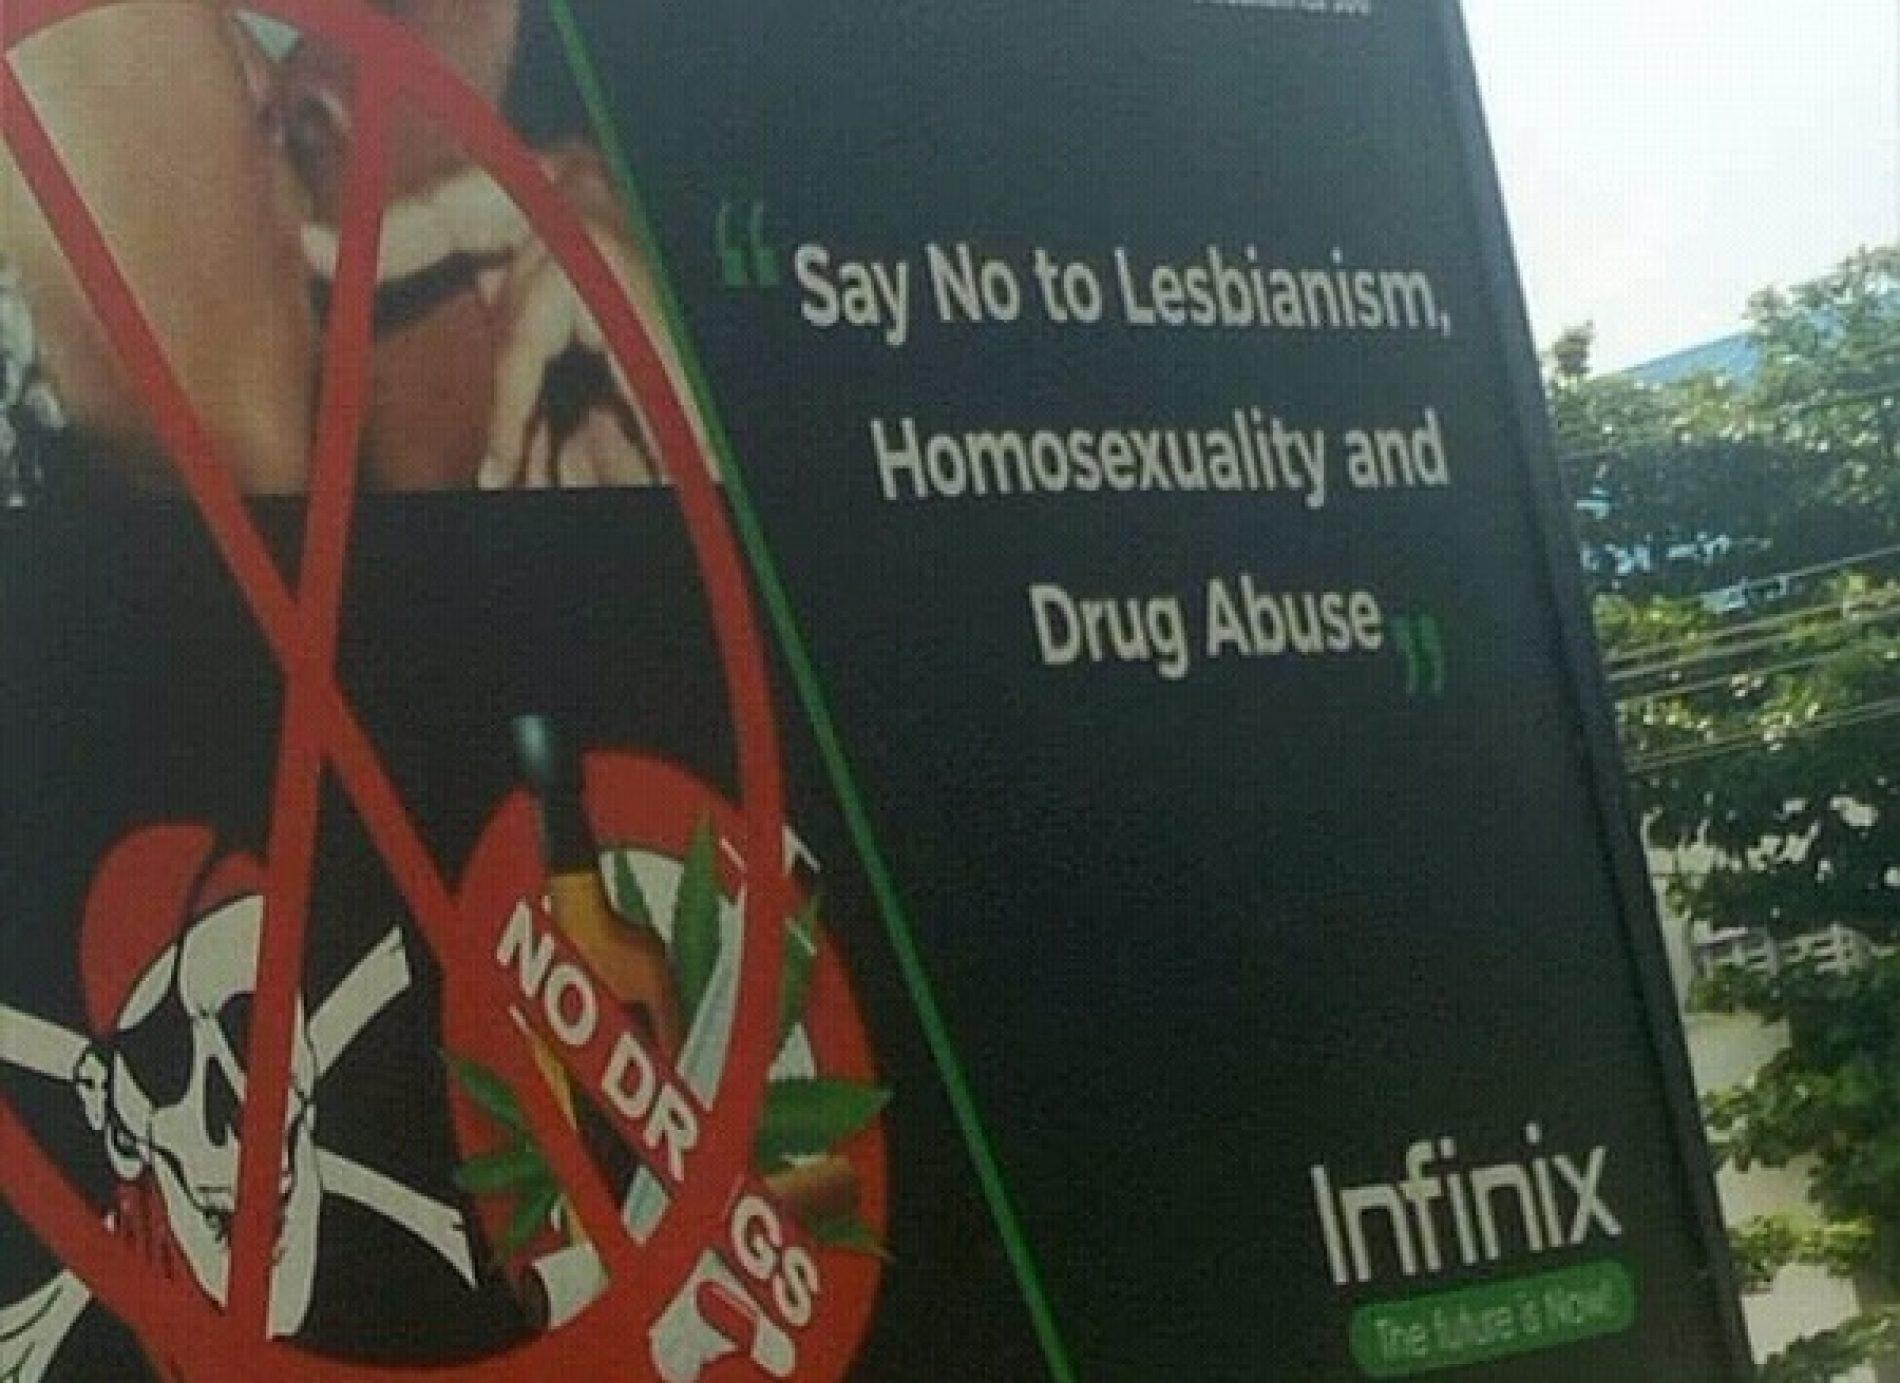 Photo: Infinix Nigeria and its homophobia